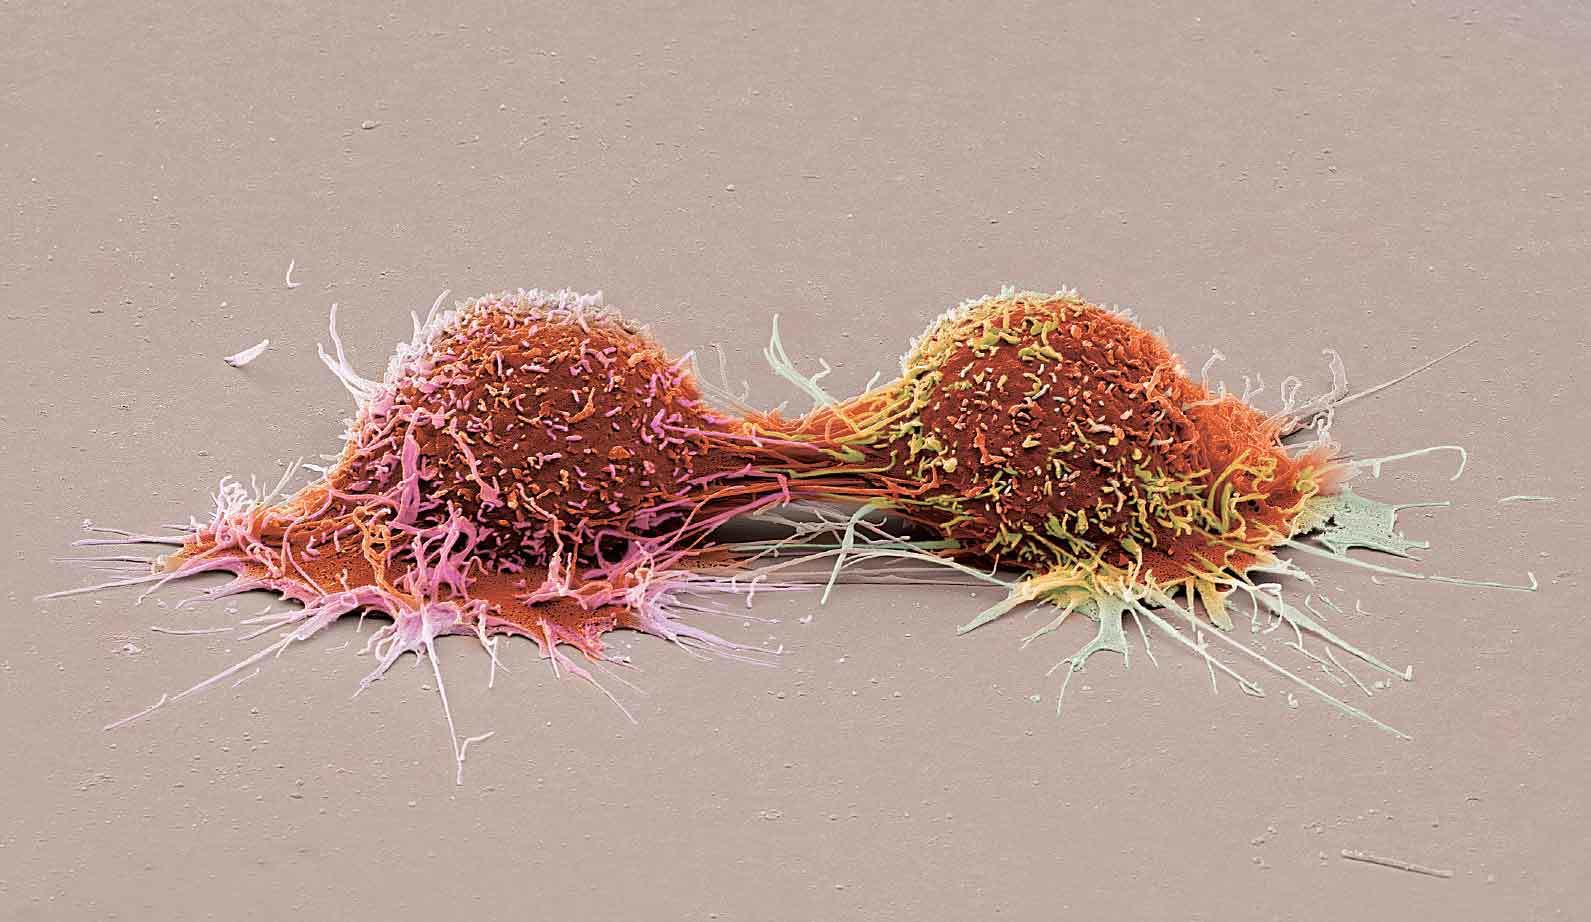 Dividing human cancer cells